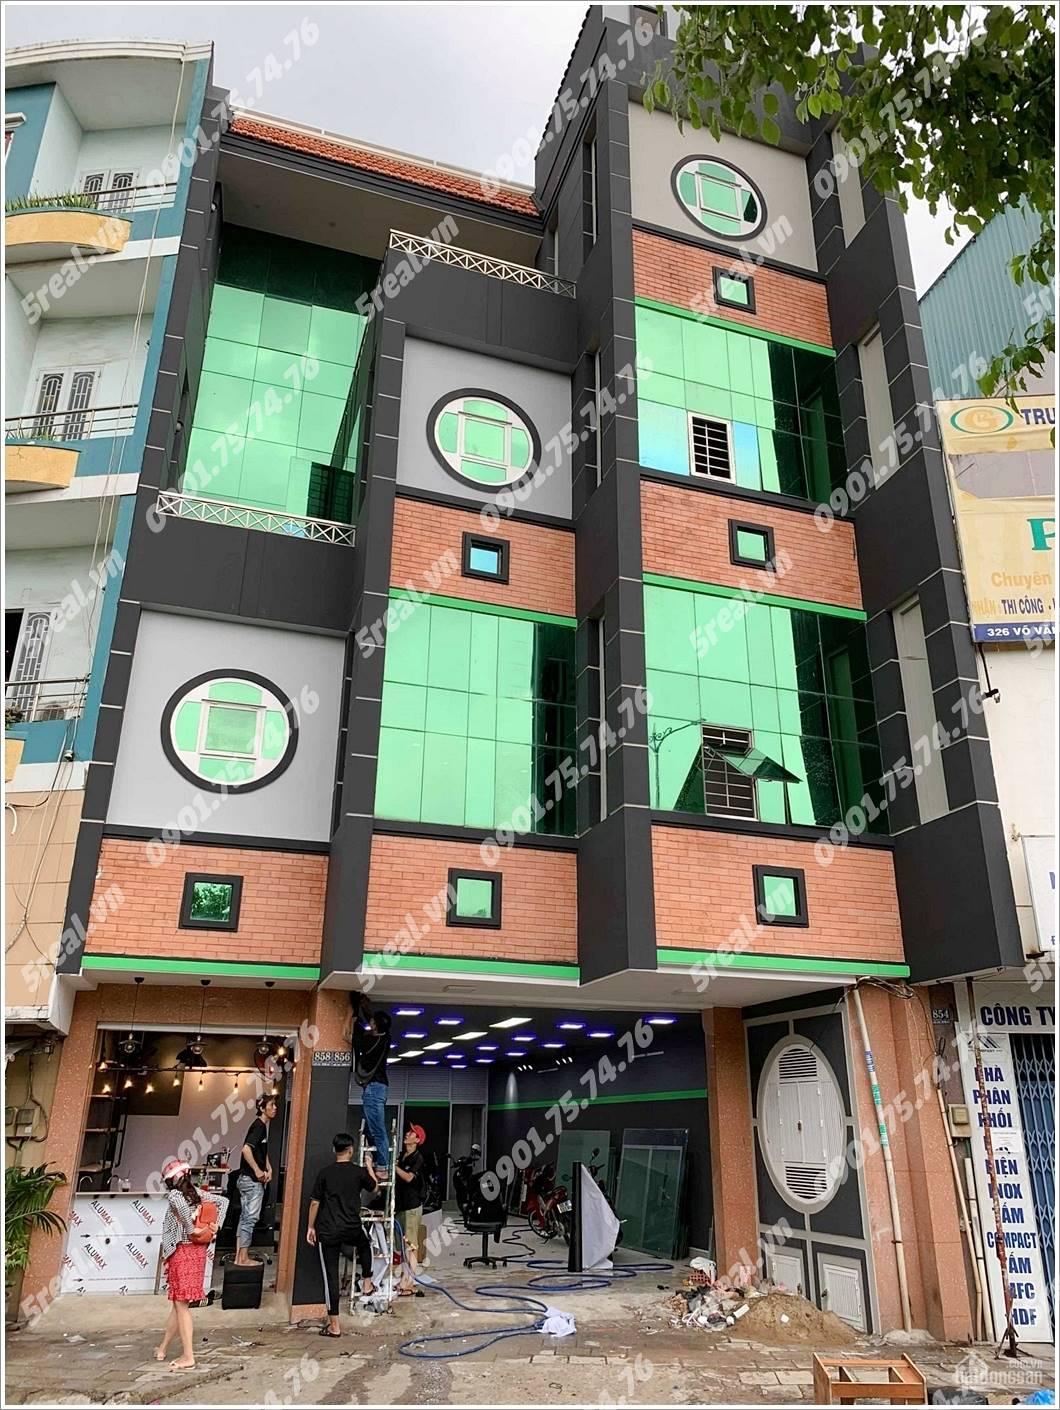 building-858-vo-van-kiet-quan-5-van-phong-cho-thue-5real.vn-01